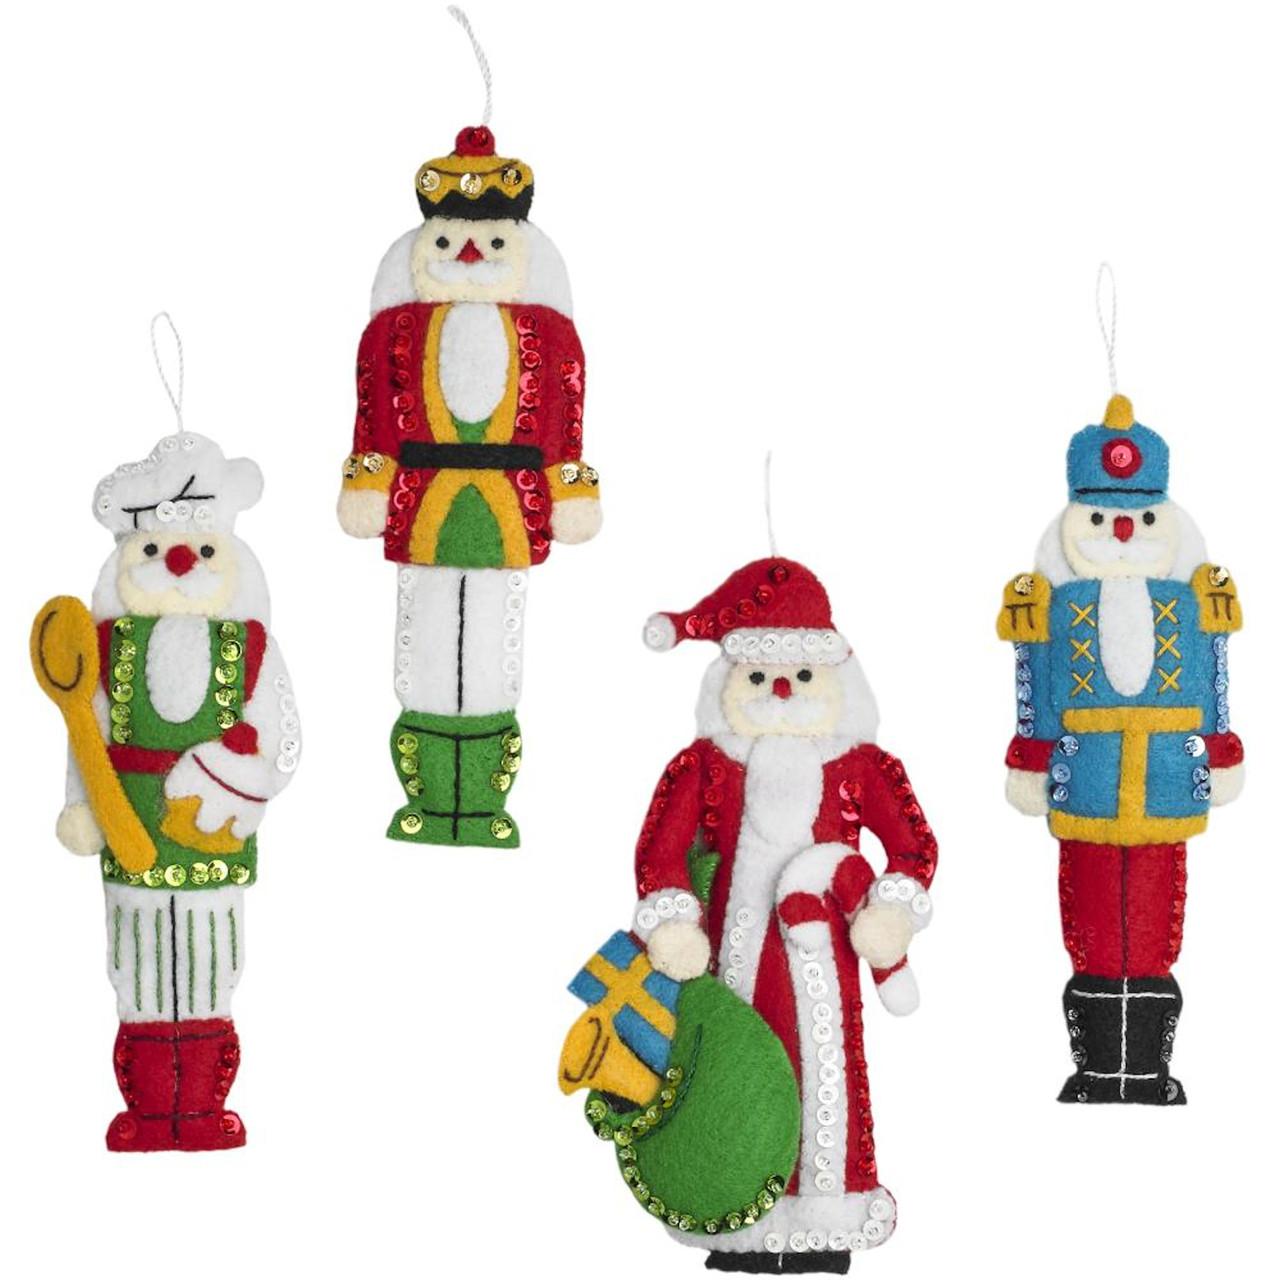 Plaid / Bucilla - Christmas Classic Nutcracker Ornaments